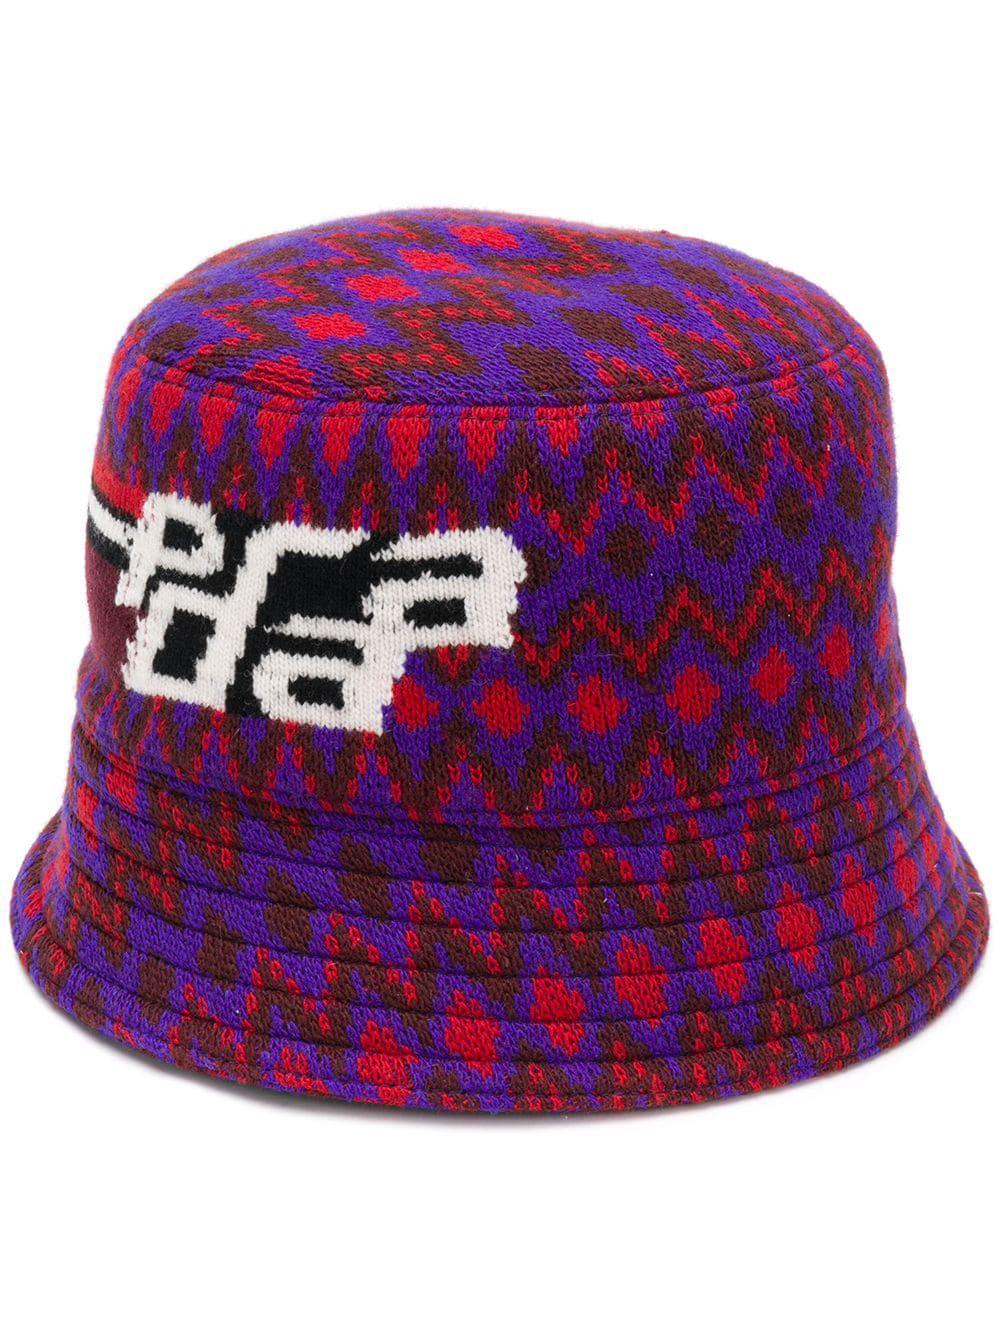 Prada Zigzag Logo Bucket Hat - Purple